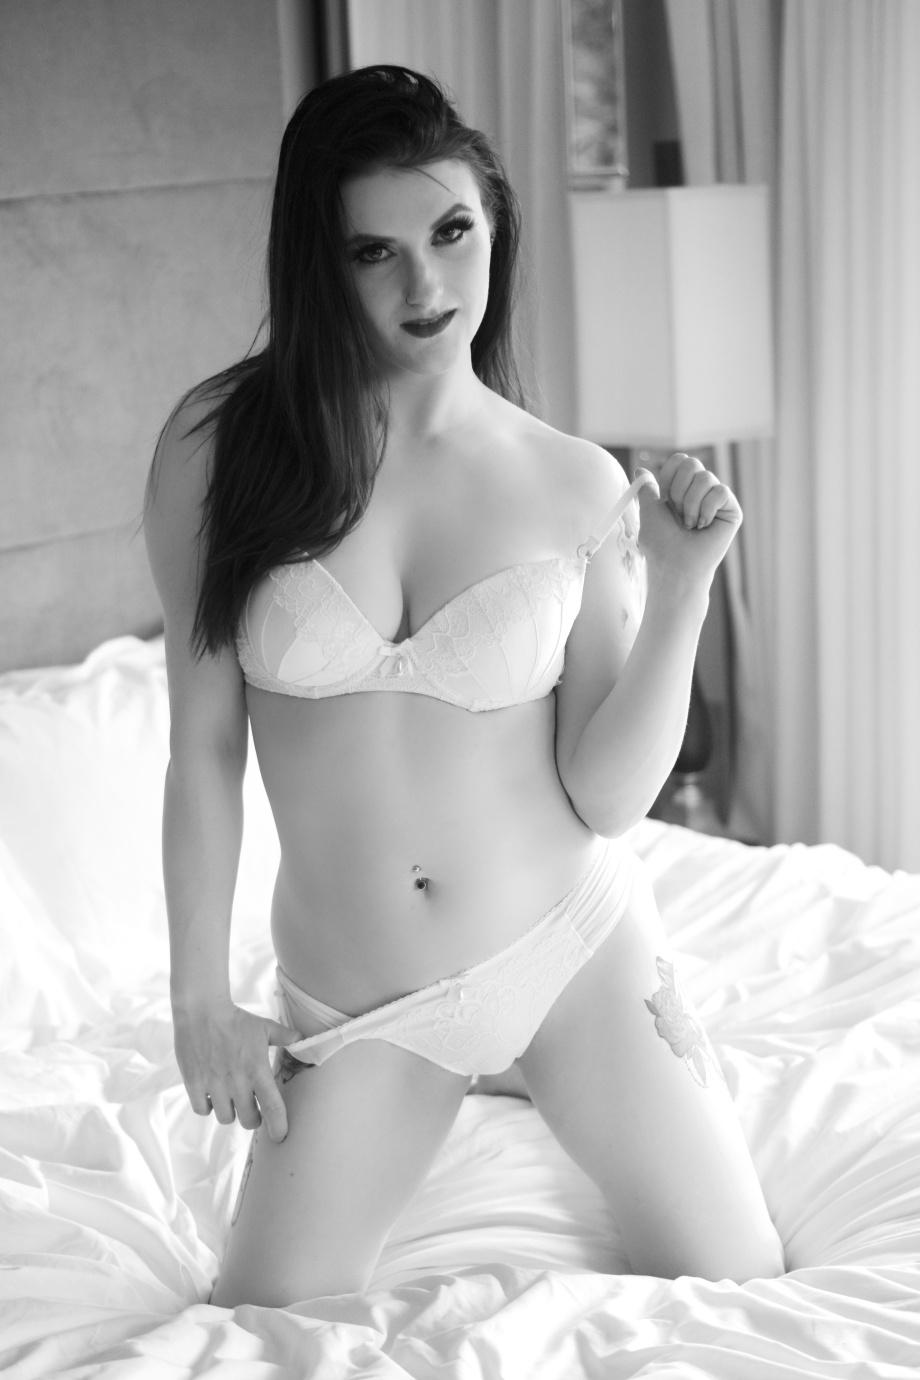 Cherry Chains, Cork, Ireland, hotel, glamour, altgirl, photoshoot, lingerie, tattoos, black and white